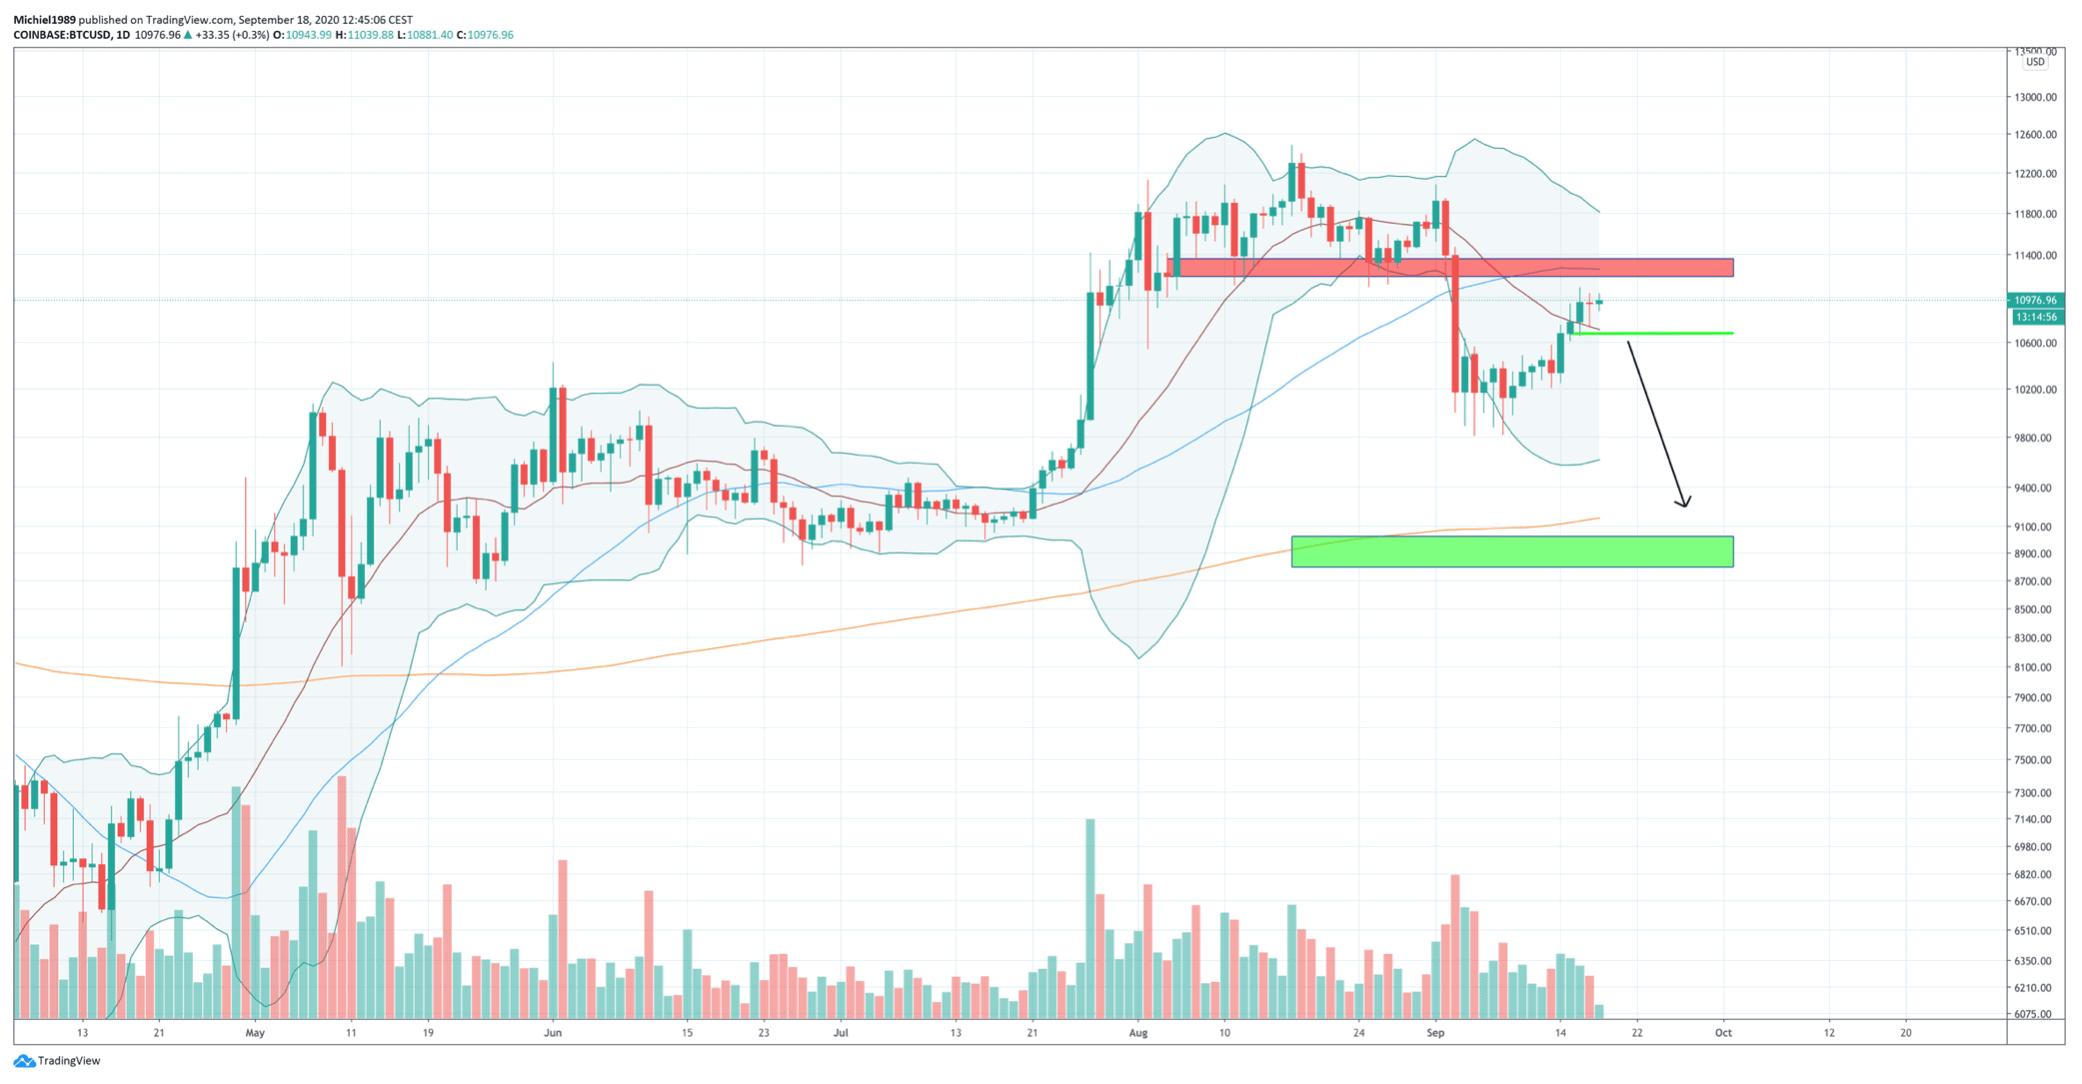 bitcoin_koers_bullish_scenario_toevlucht_in_goud_BTC_grafiek_coinbase